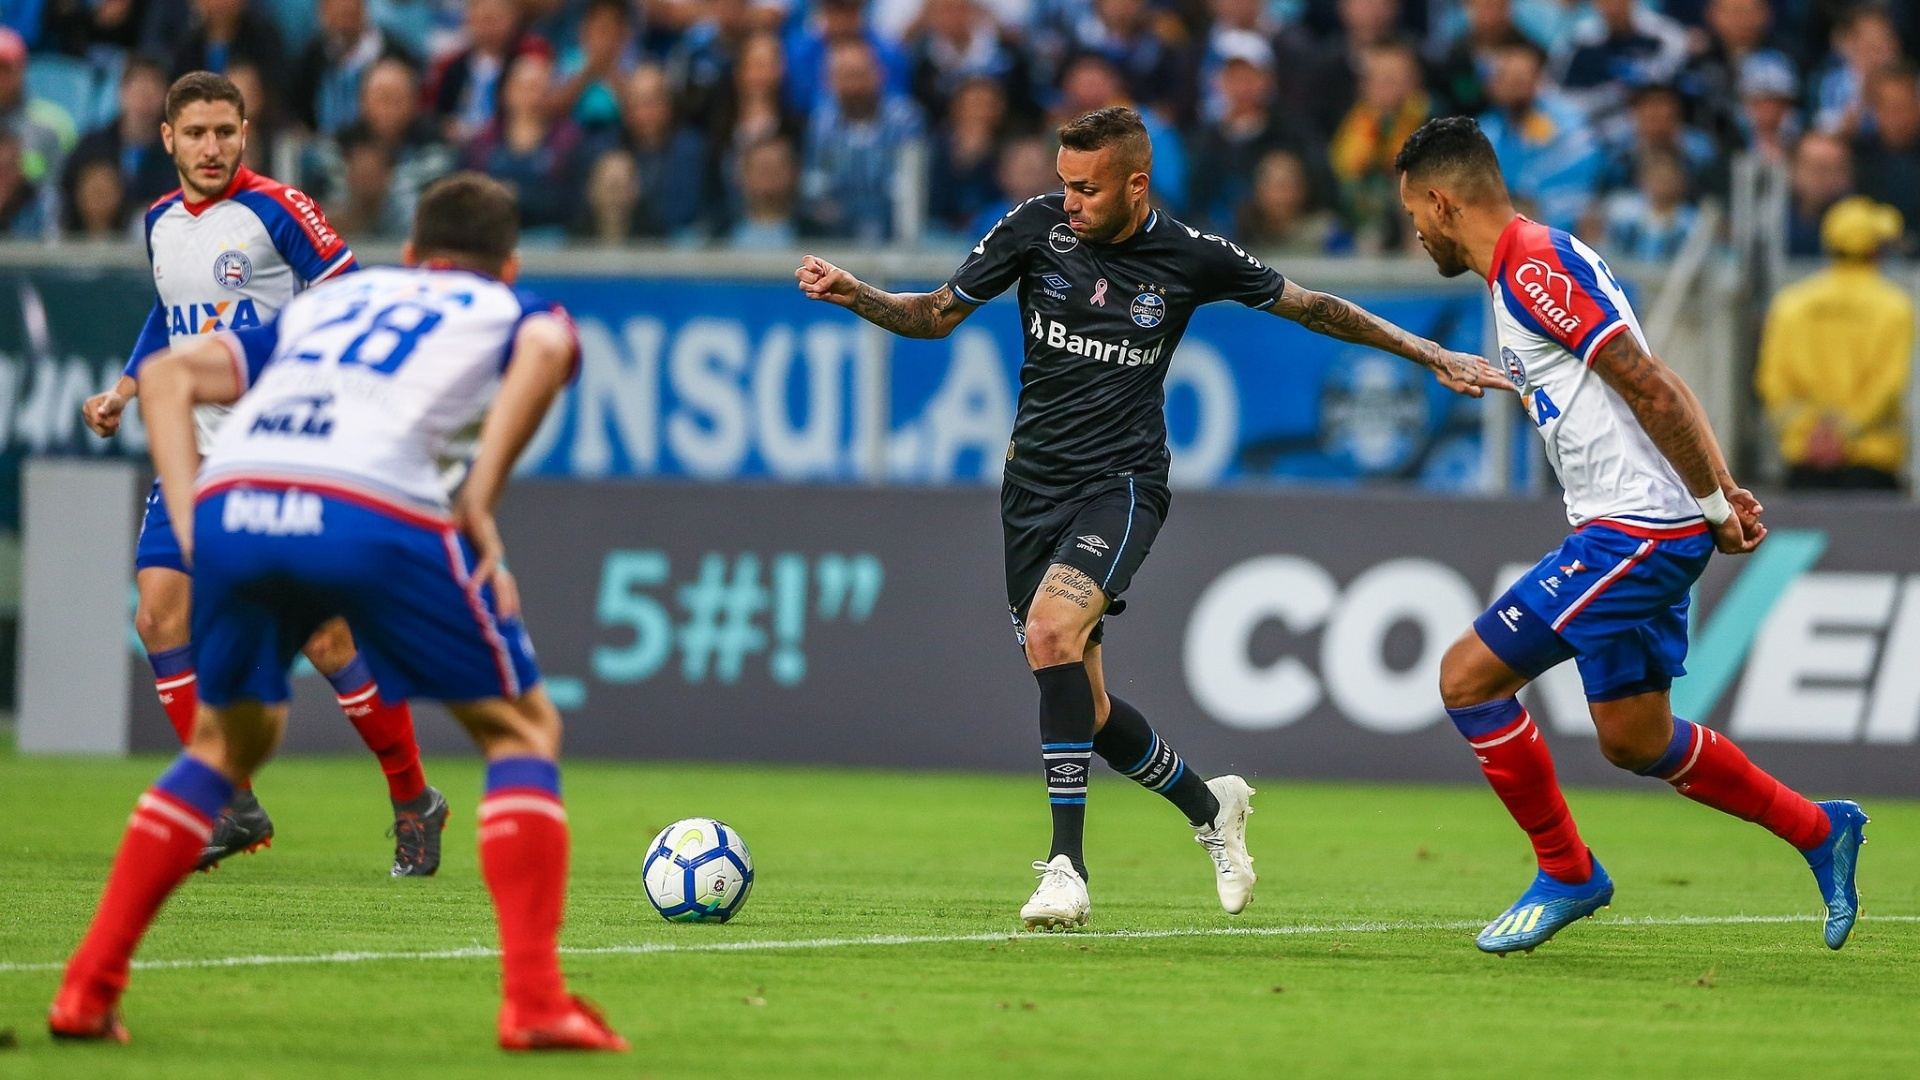 Luan carrega a bola durante jogo entre Grêmio e Bahia